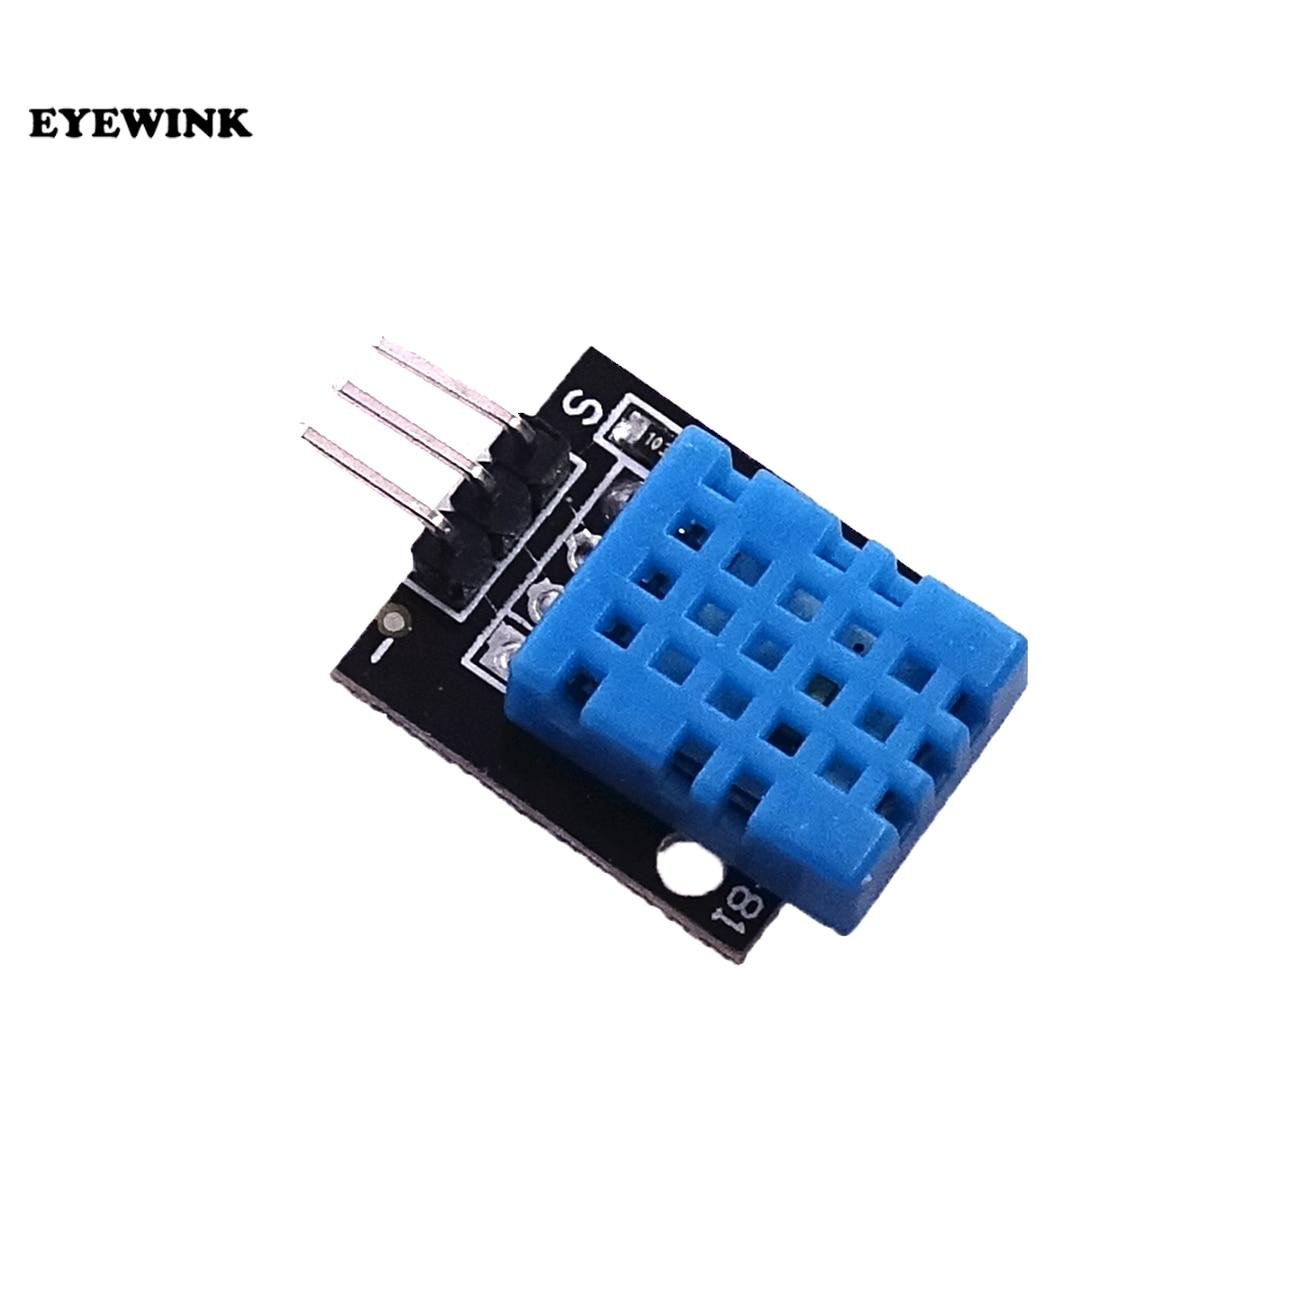 Hall Effect Sensor Module for Arduinodigital active-low5 VKEYES KY-003